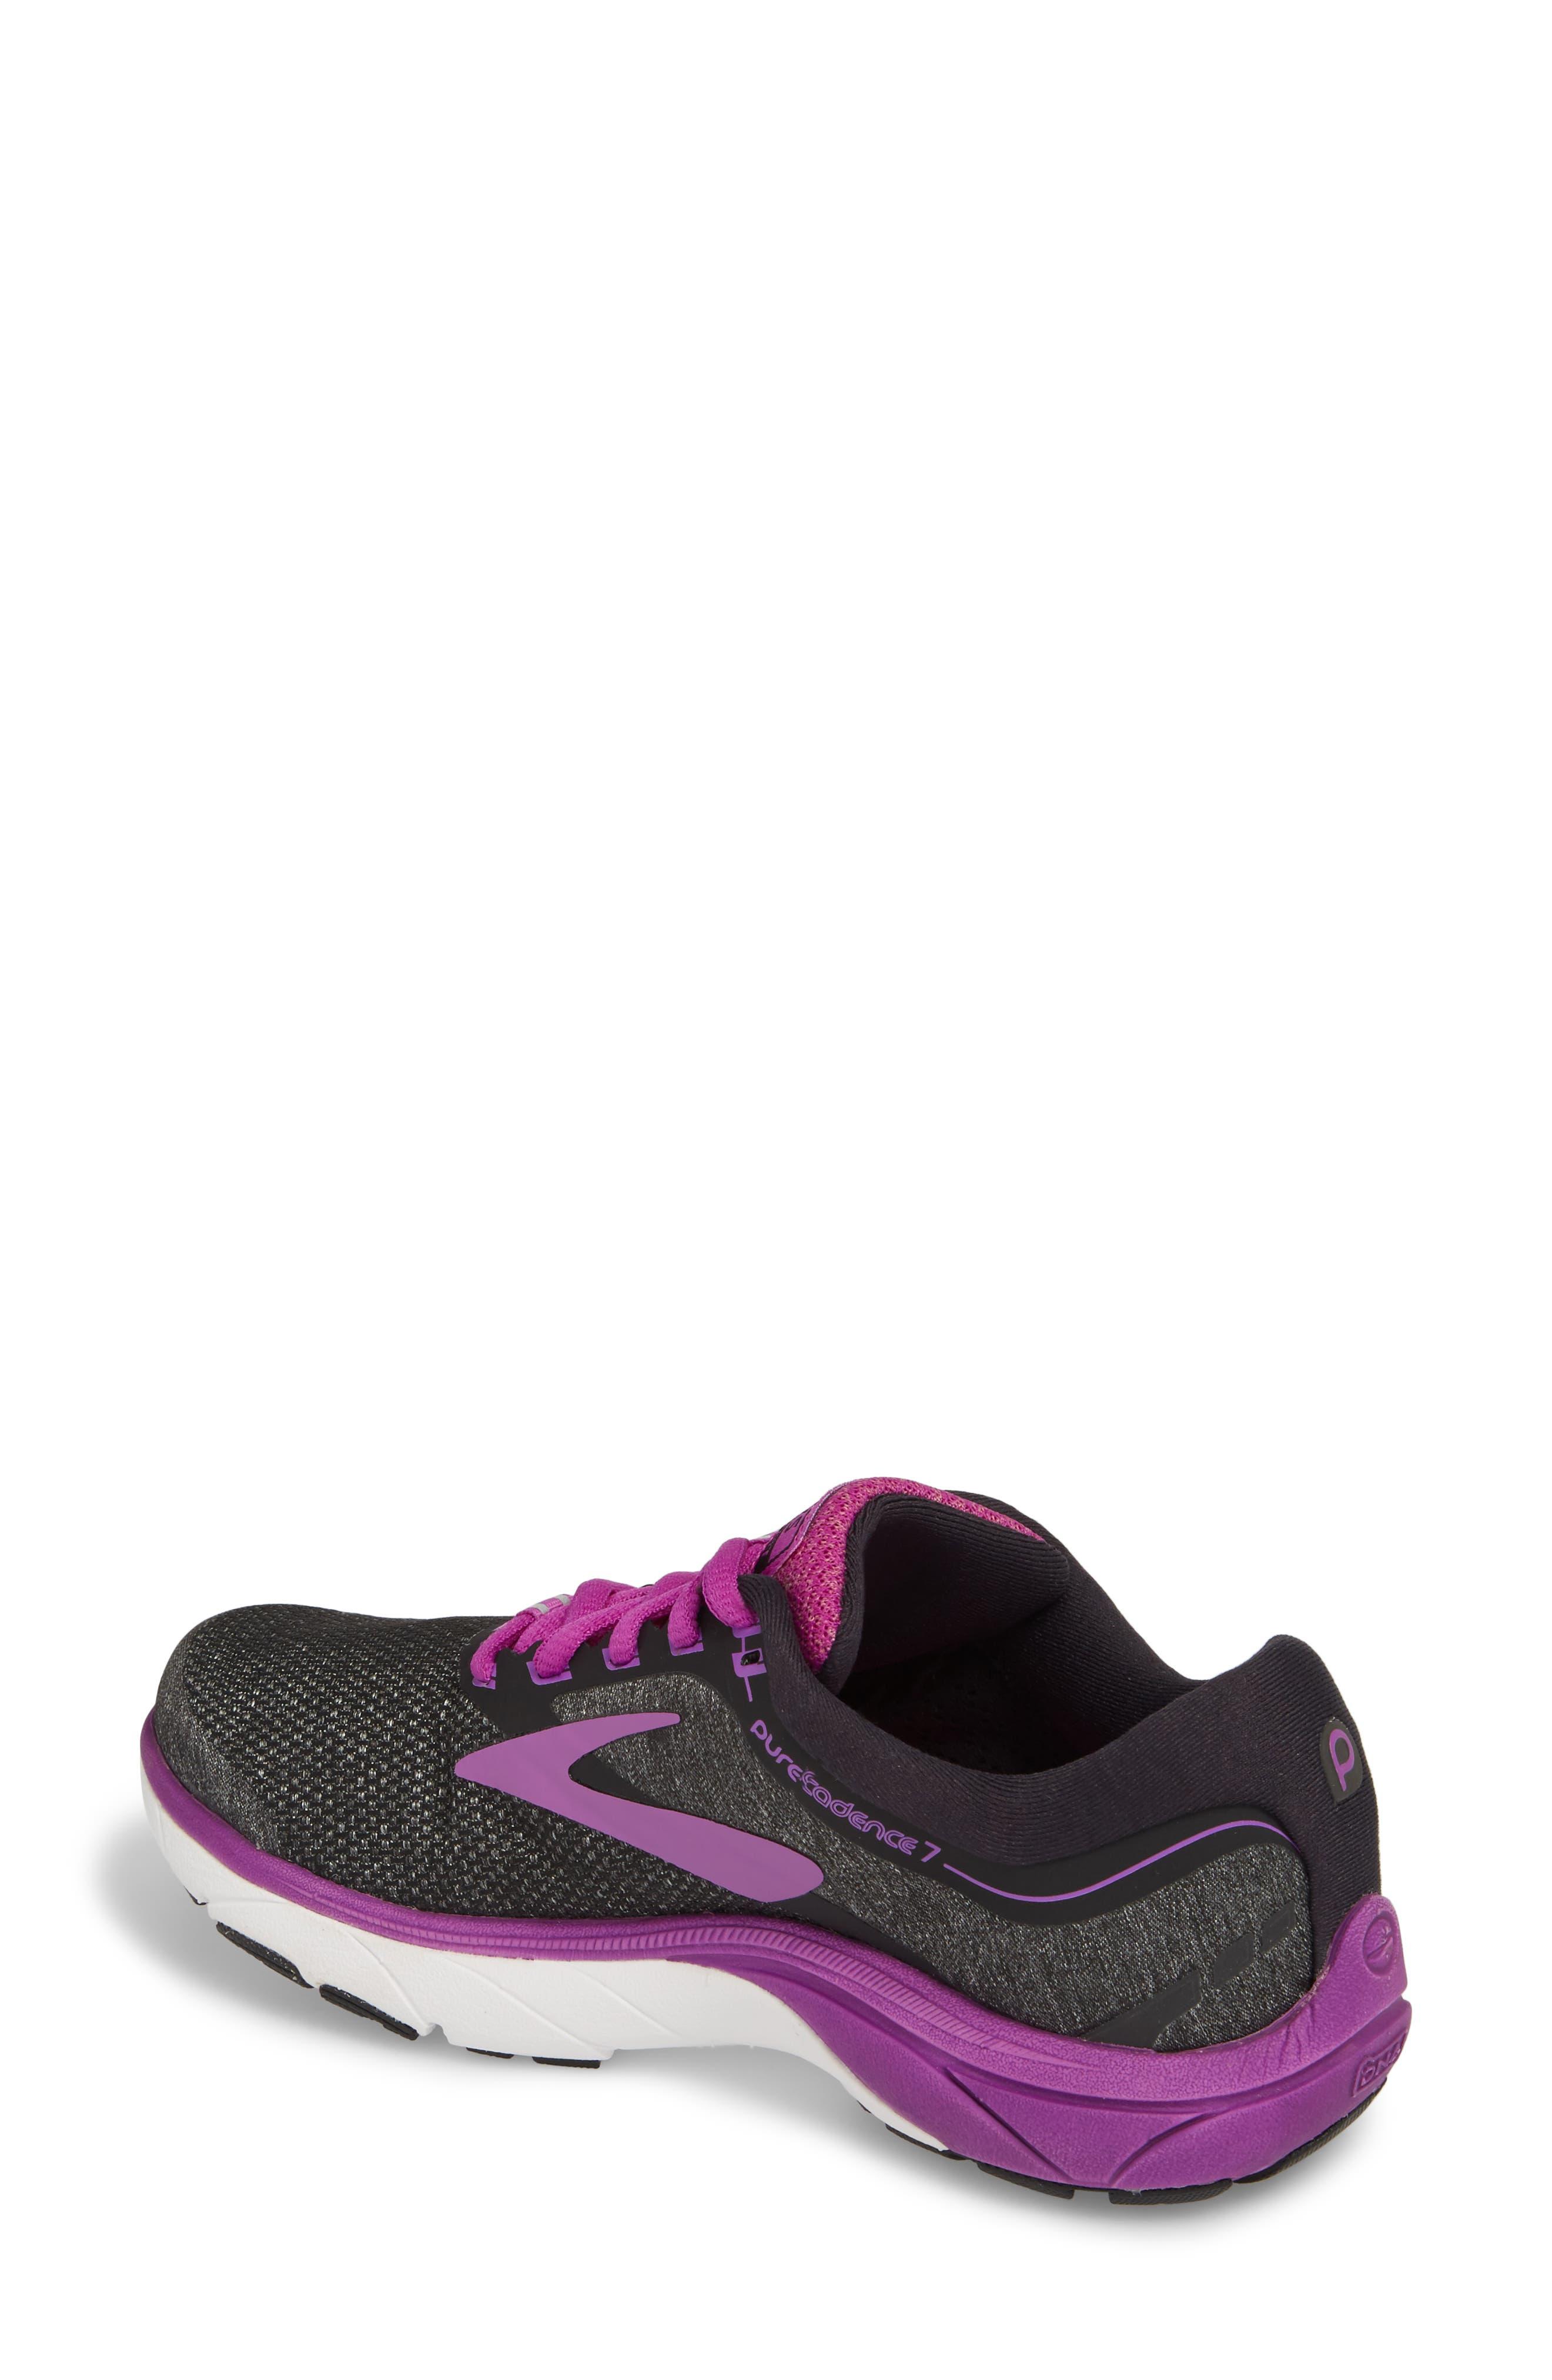 PureCadence 7 Road Running Shoe,                             Alternate thumbnail 2, color,                             BLACK/ PURPLE/ MULTI